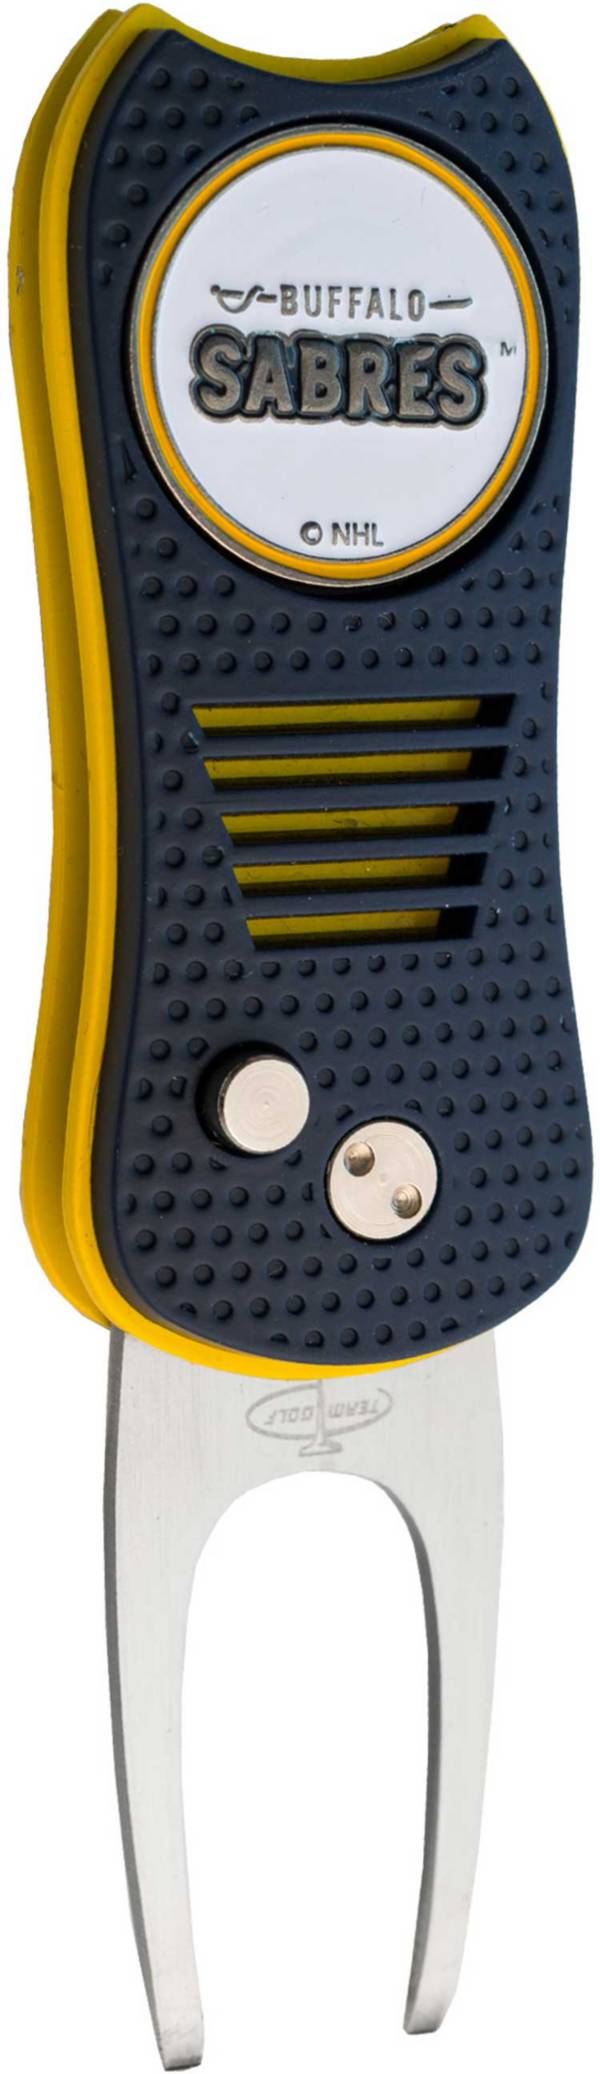 Team Golf Switchfix Buffalo Sabres Divot Tool product image